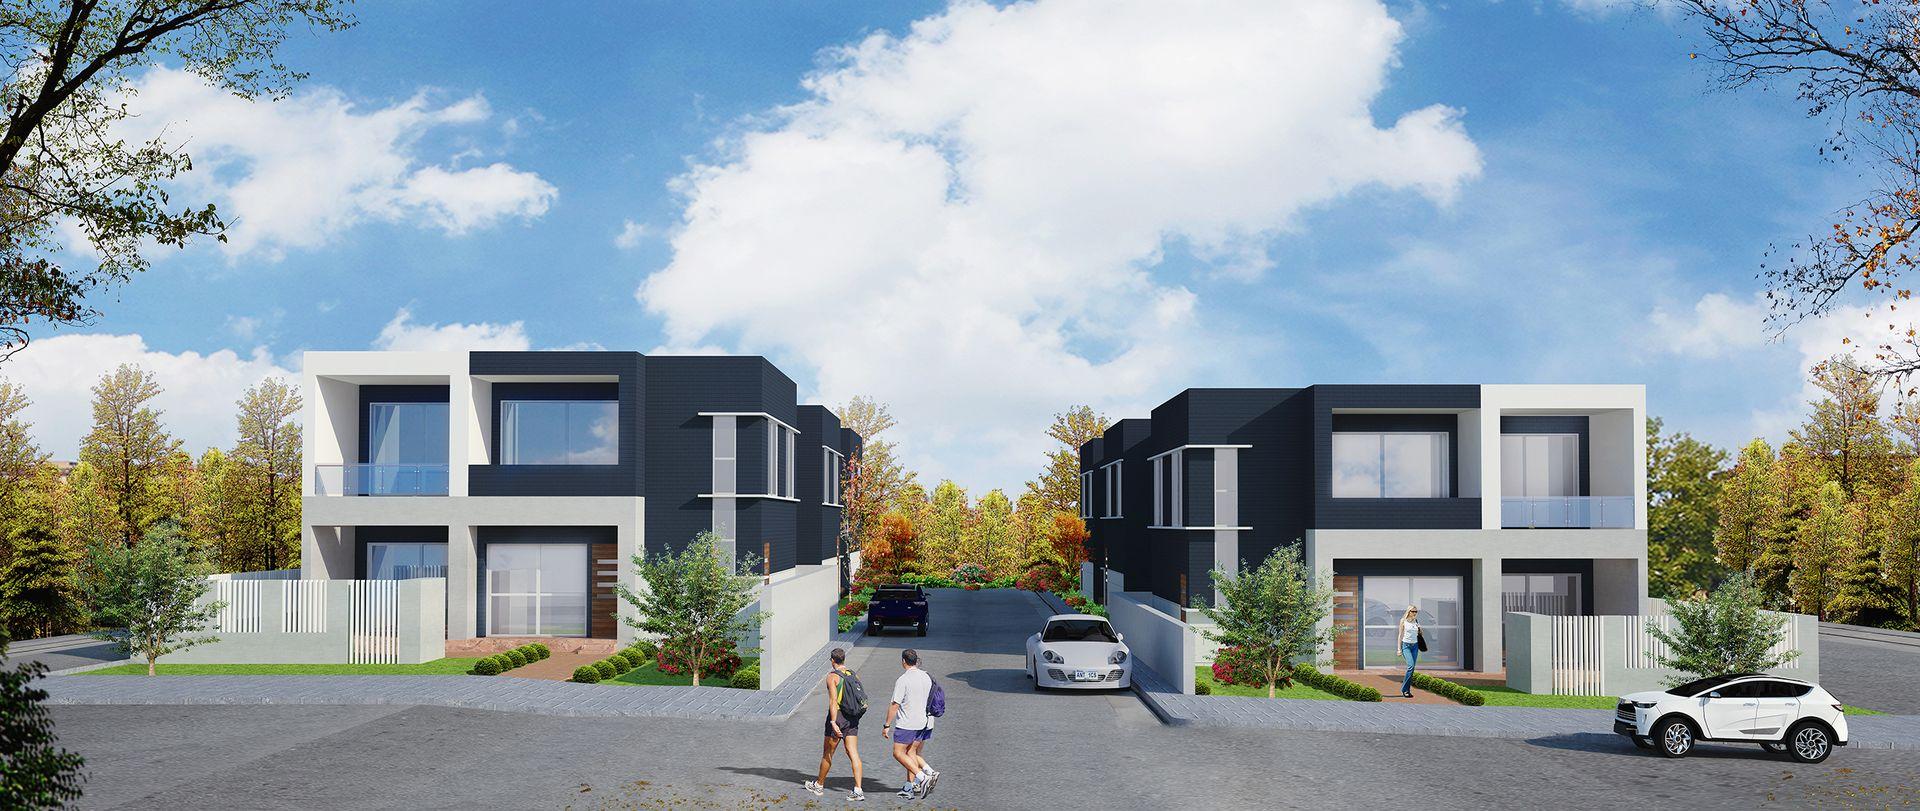 60-62 Telopea Avenue, Caringbah South NSW 2229, Image 0